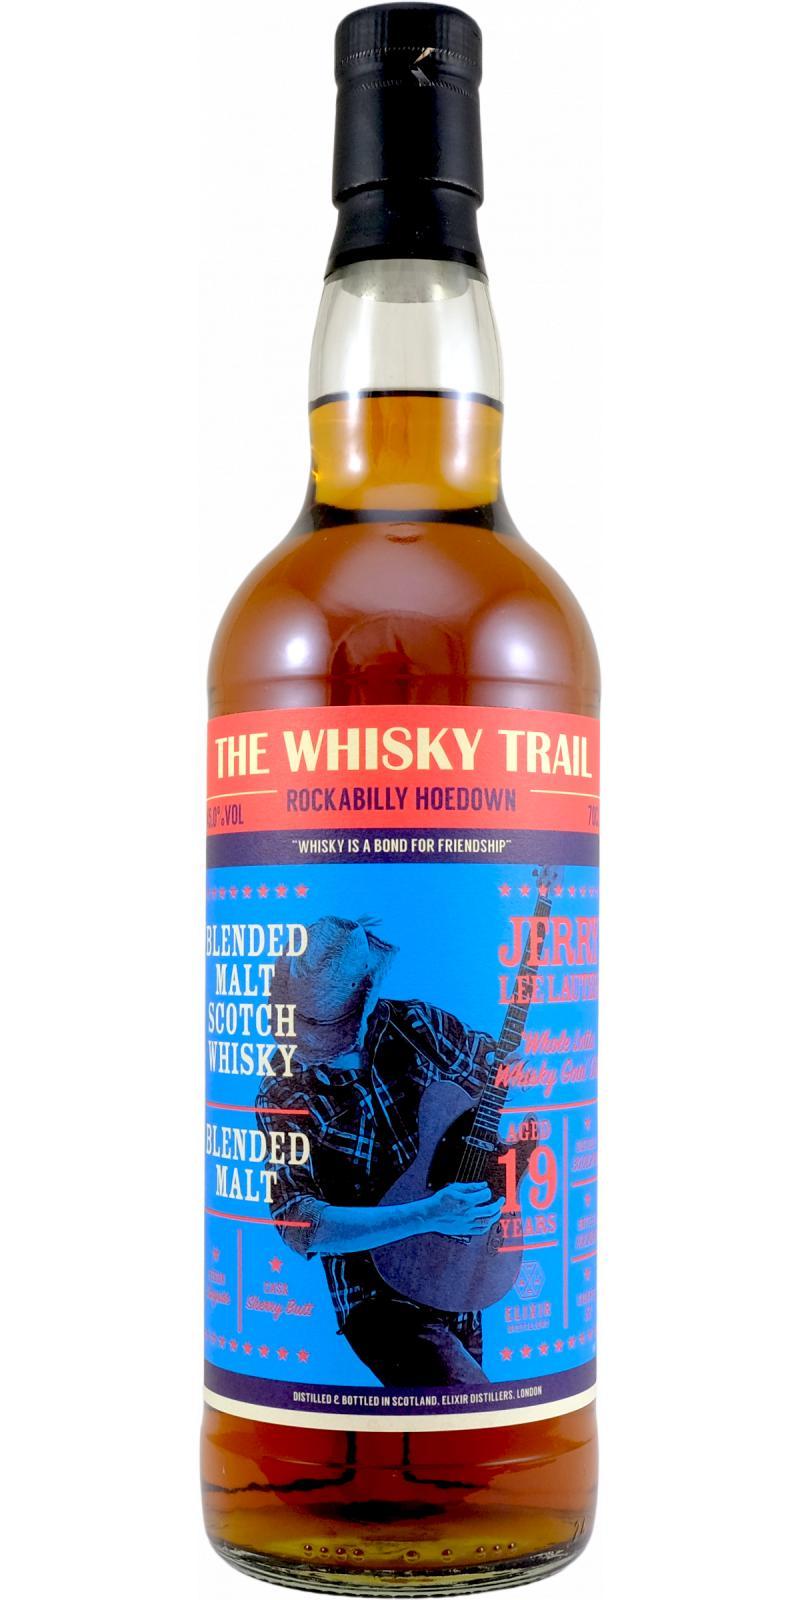 Blended Malt Scotch Whisky 2001 ElD